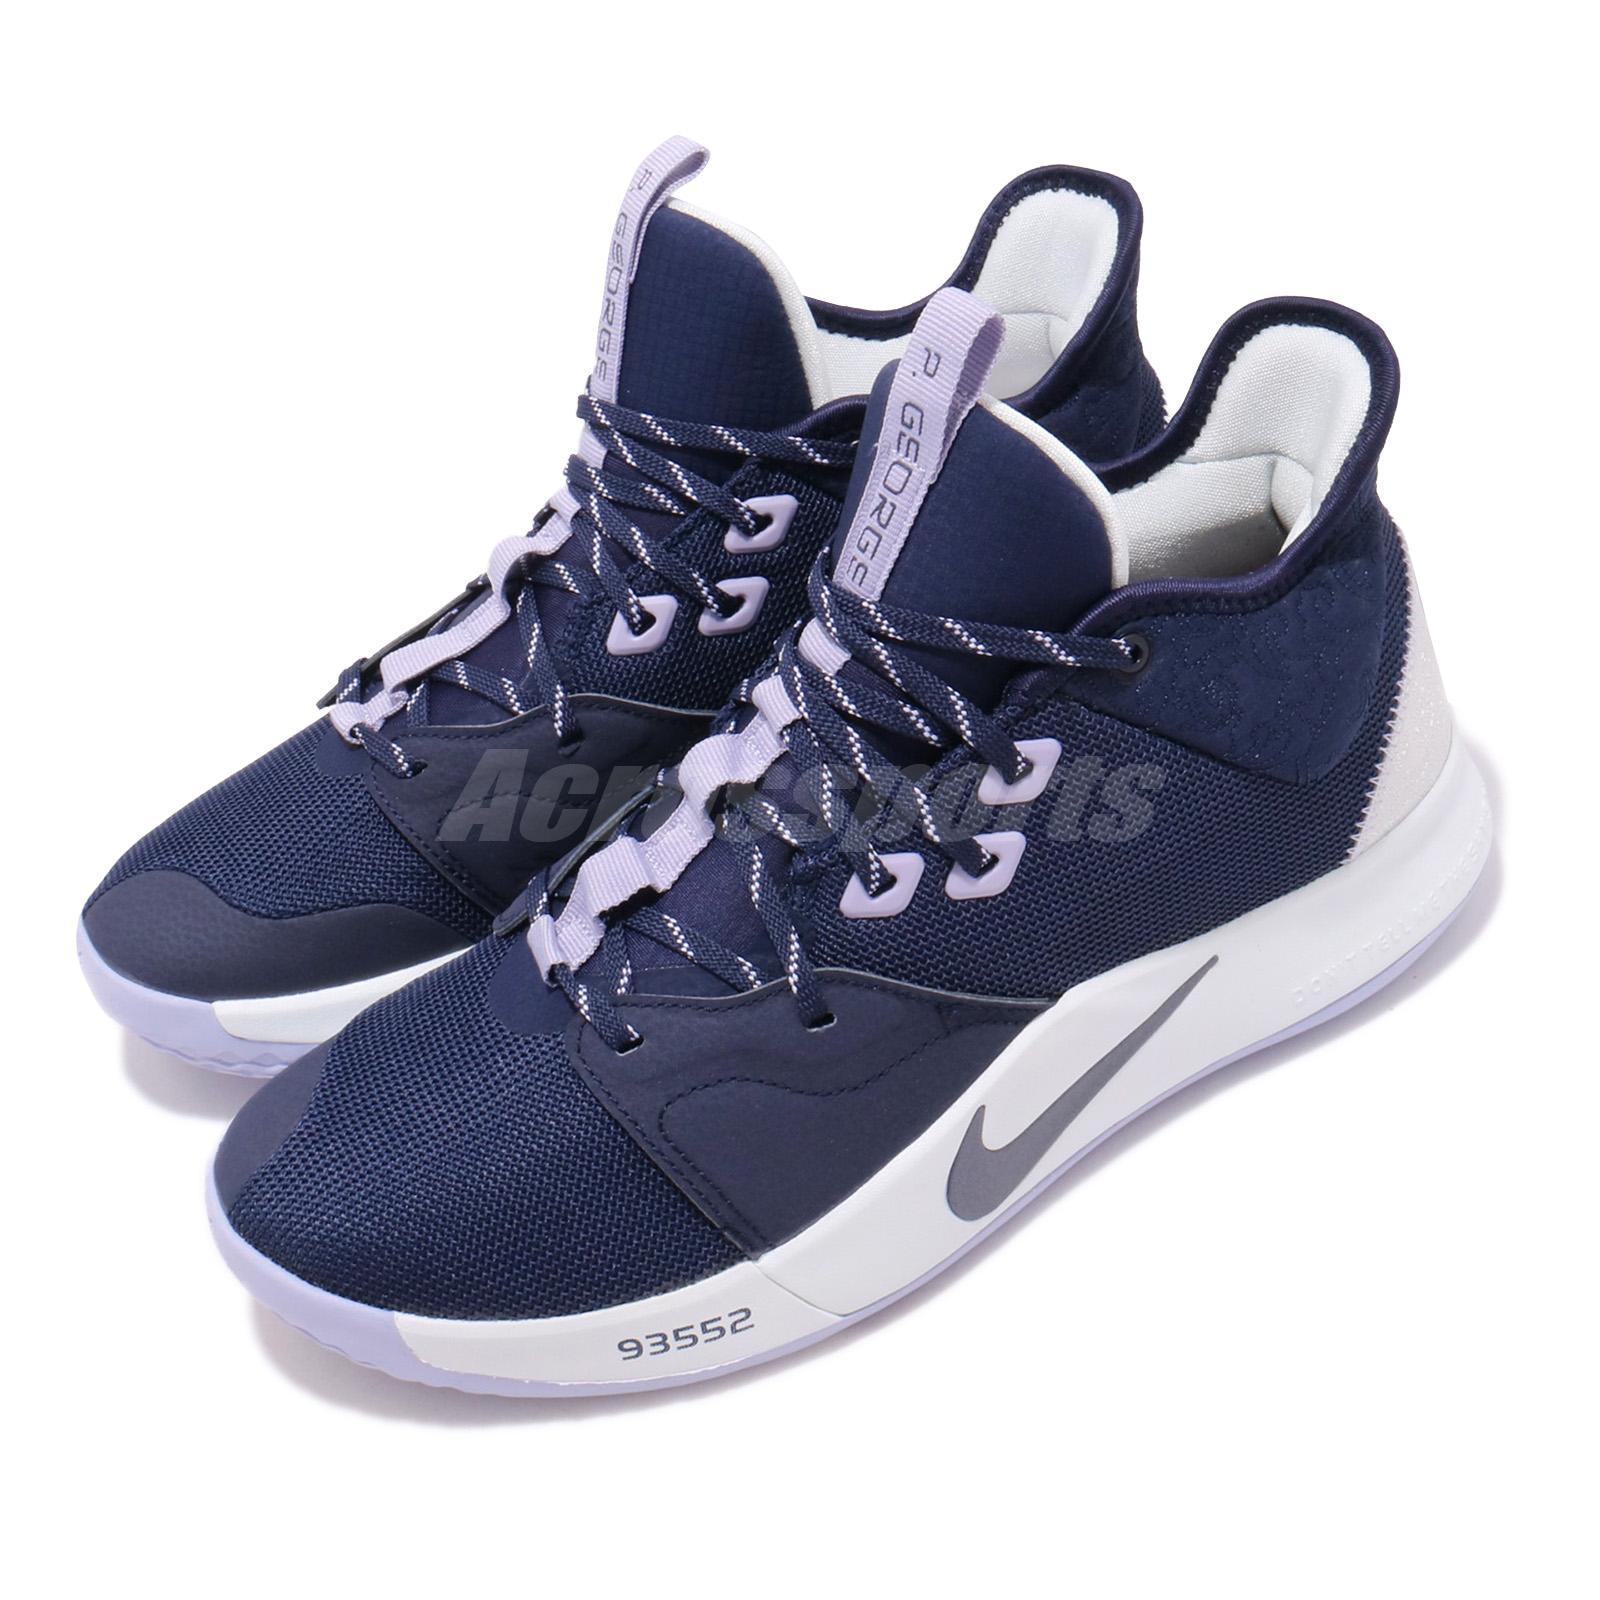 best loved c5e97 9f5d6 Details about Nike PG 3 EP Paul George III Paulette Navy Purple Men  Basketball Shoe AO2608-901